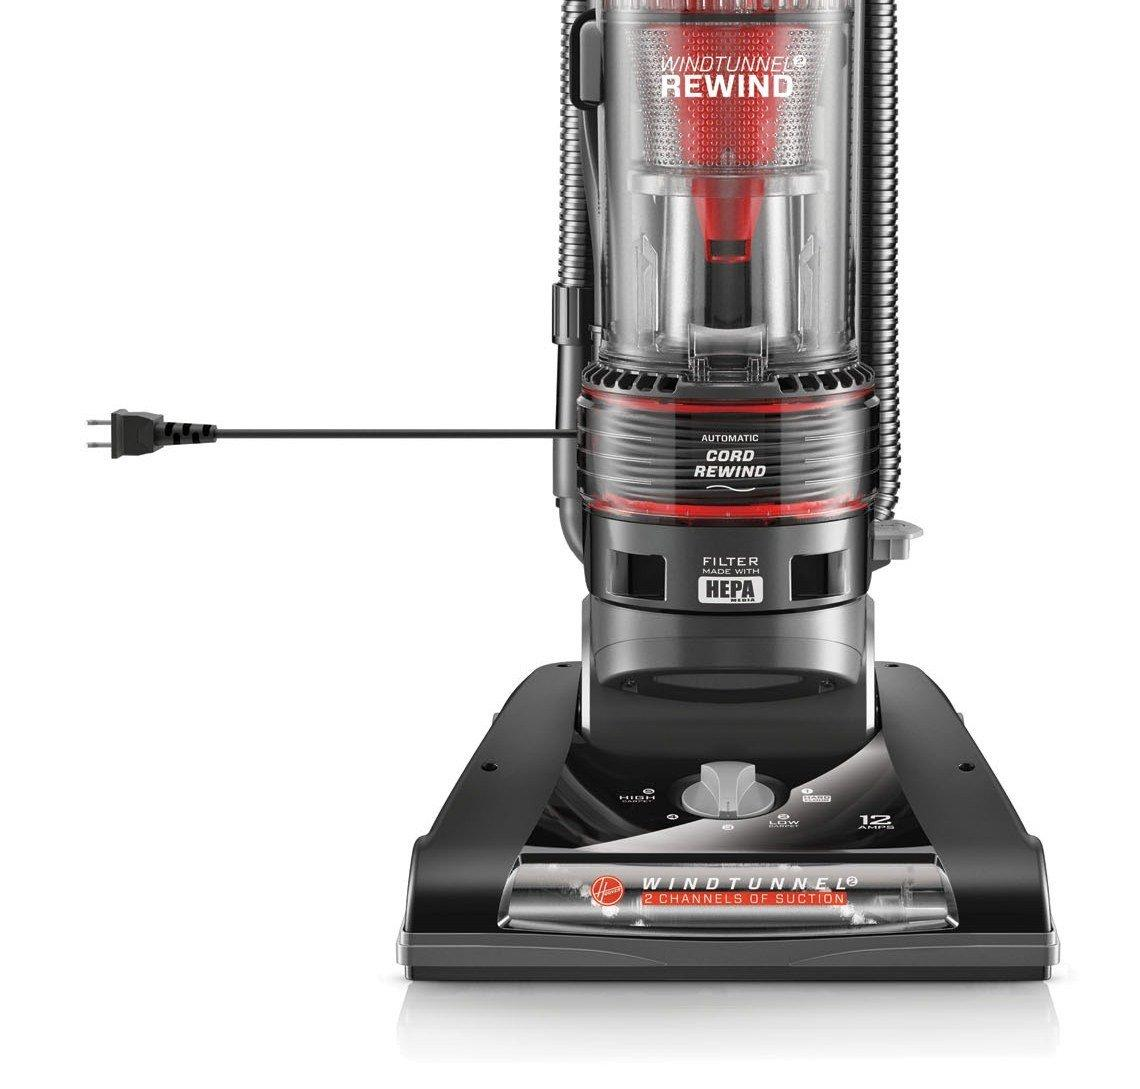 Reconditioned WindTunnel 2 Rewind Upright Vacuum4